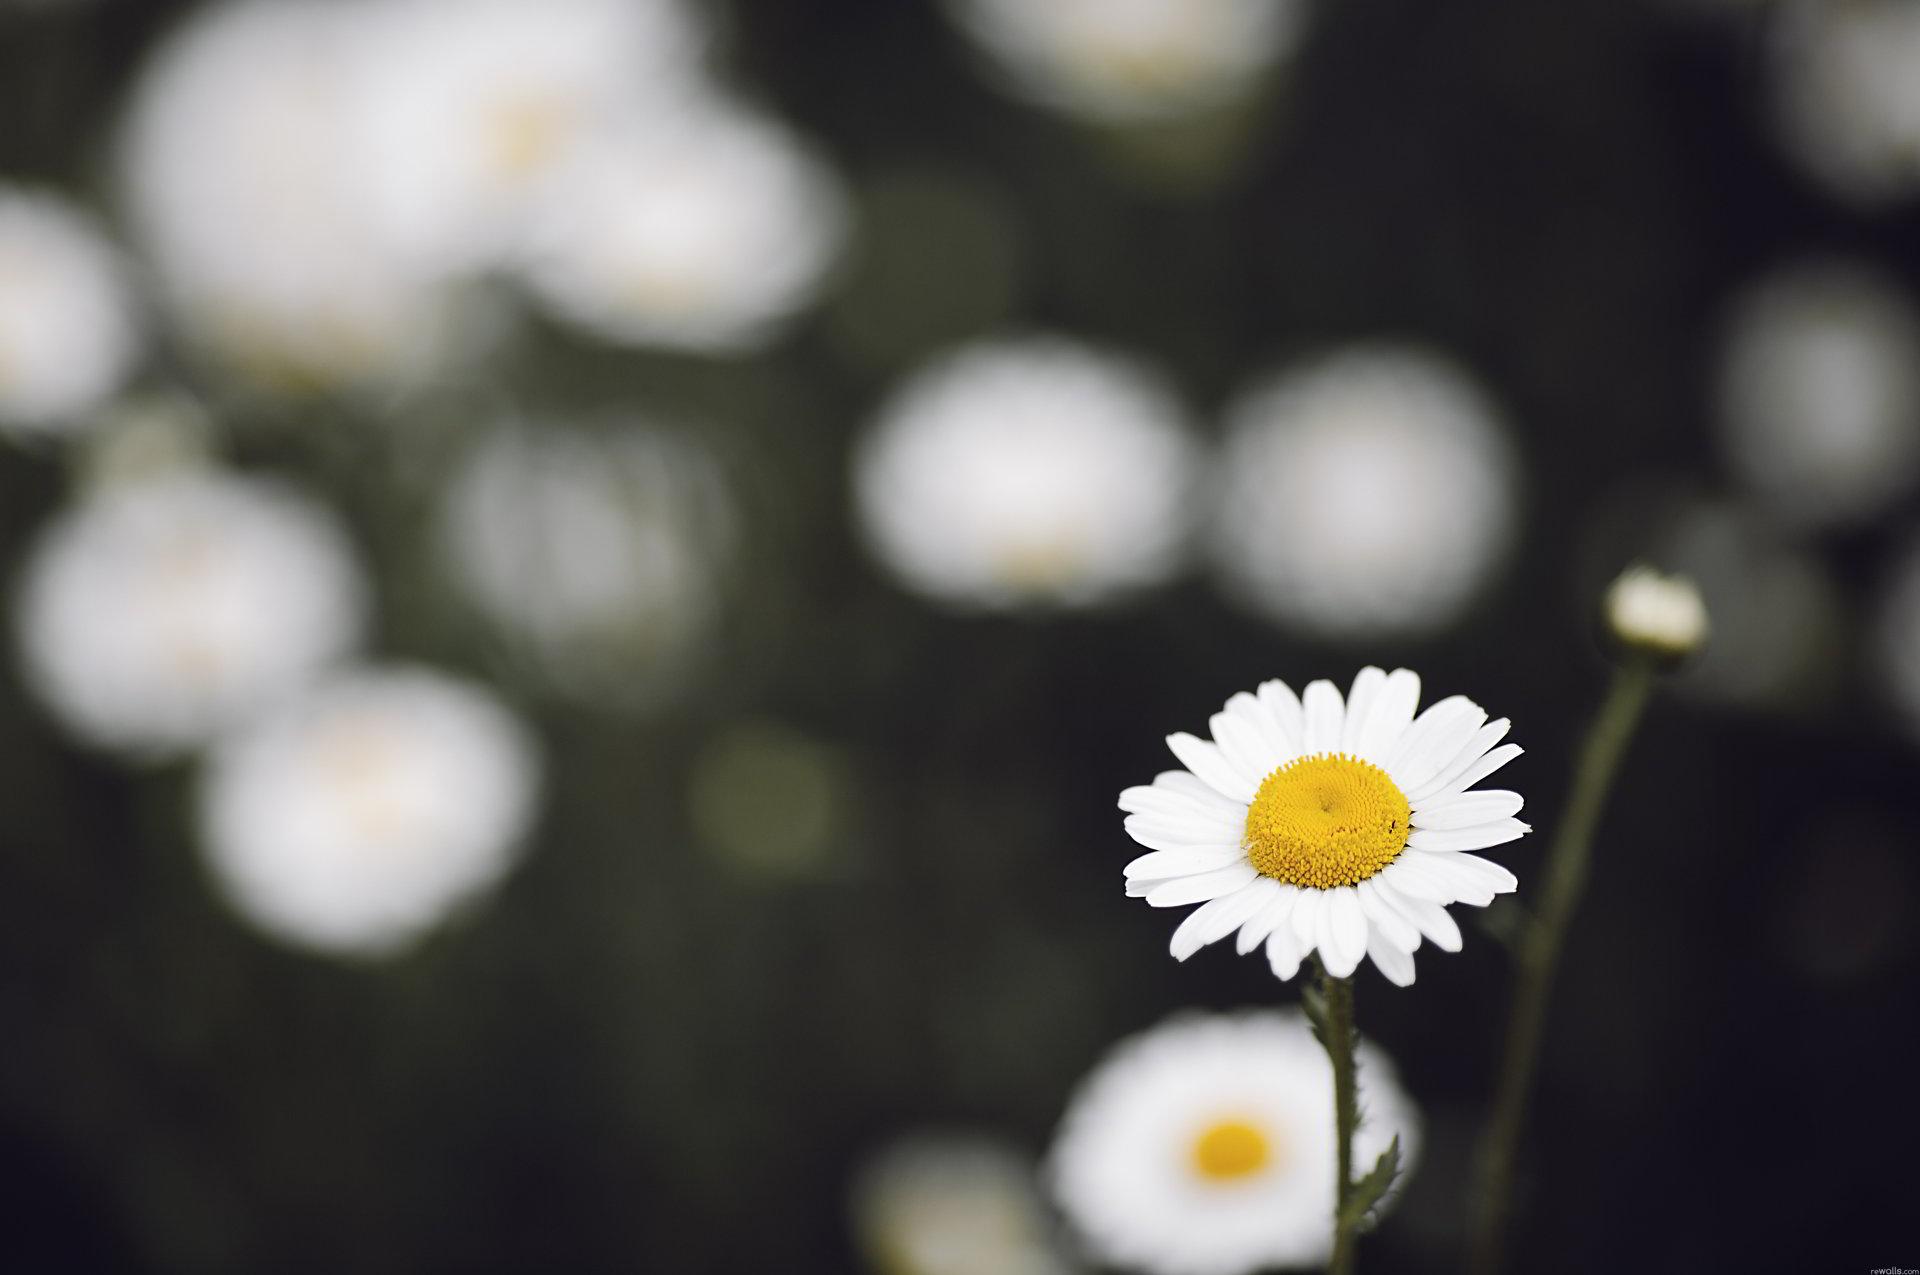 hinh anh hoa cuc dep 7